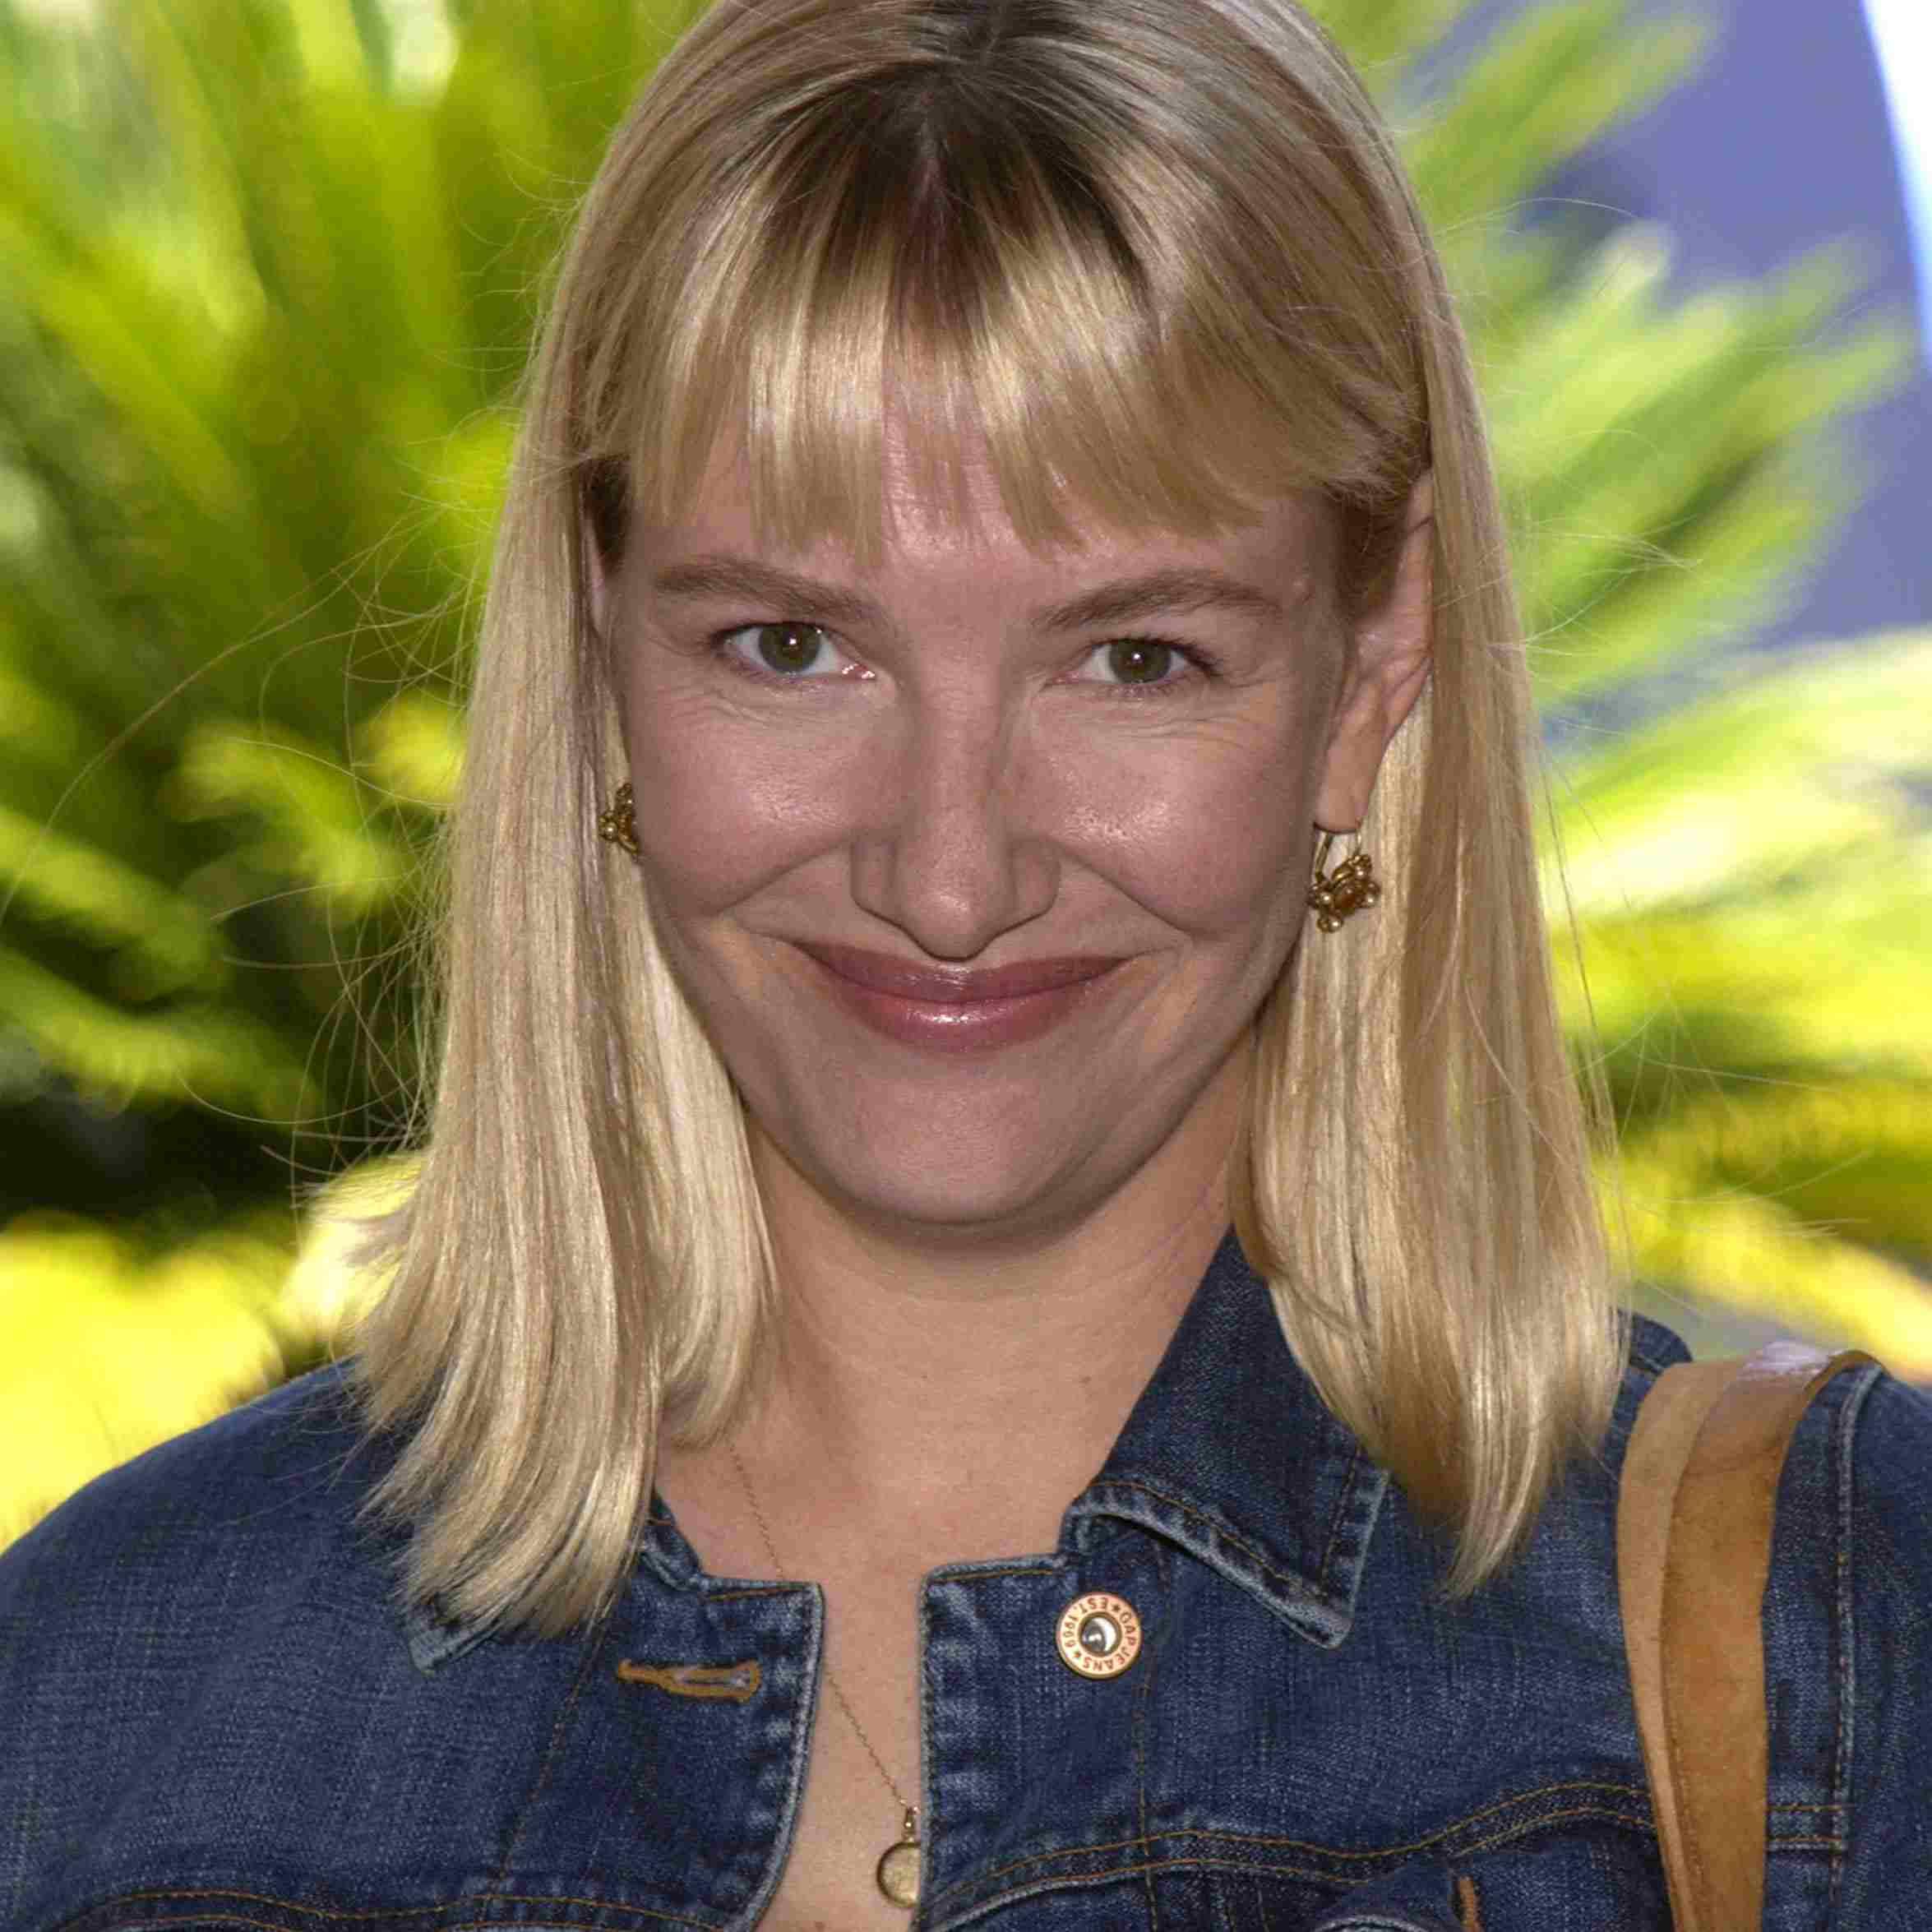 Ashley Gardner during Fox Broadcasting Summer 2002 Press Tour - Day 2 at Ritz Carlton Hotel in Pasadena, California, United States.